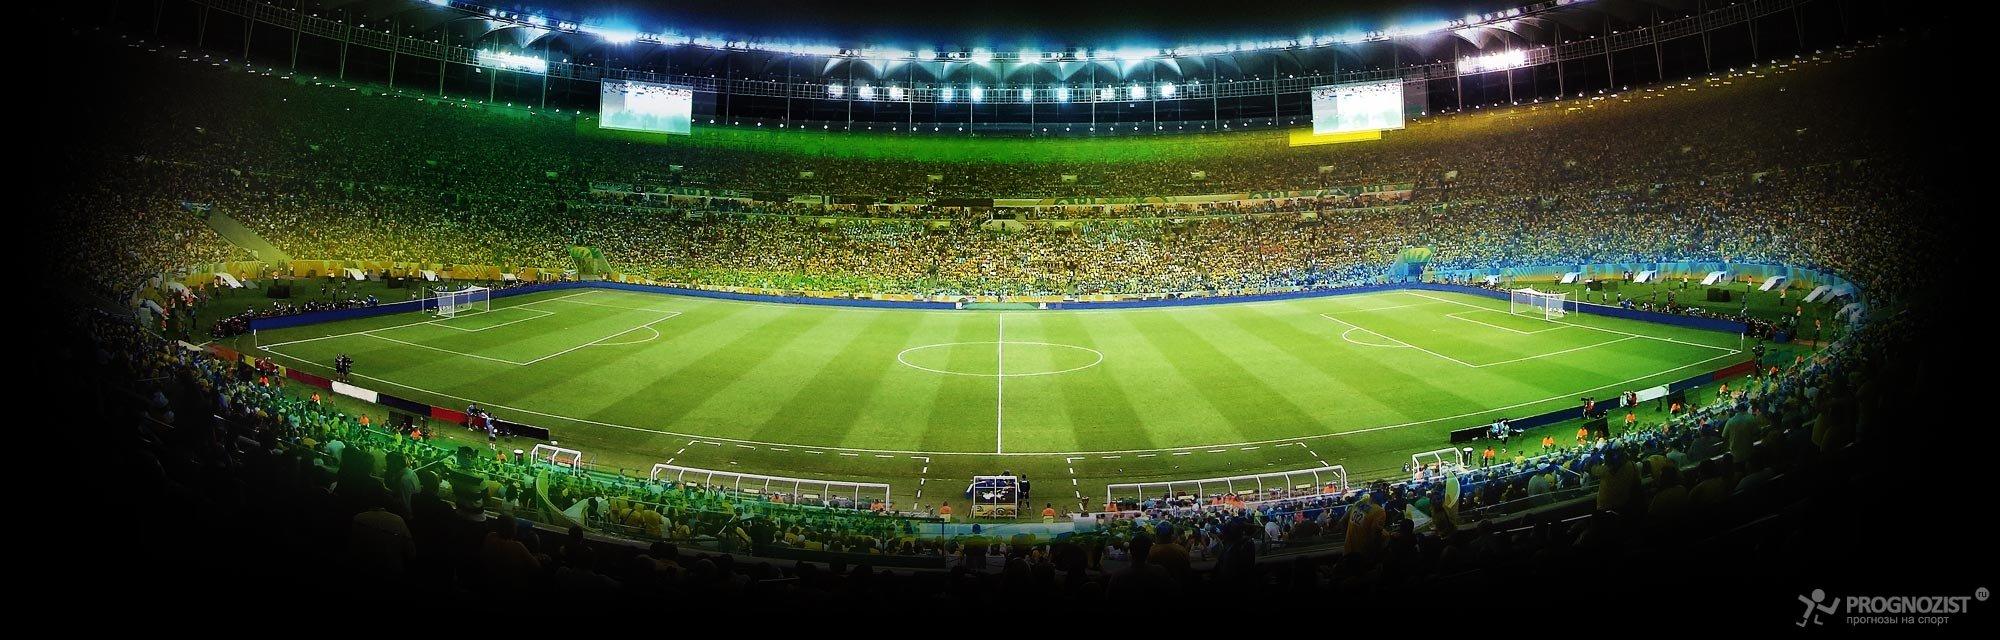 прогноз на футбол с анализом бесплатно 720